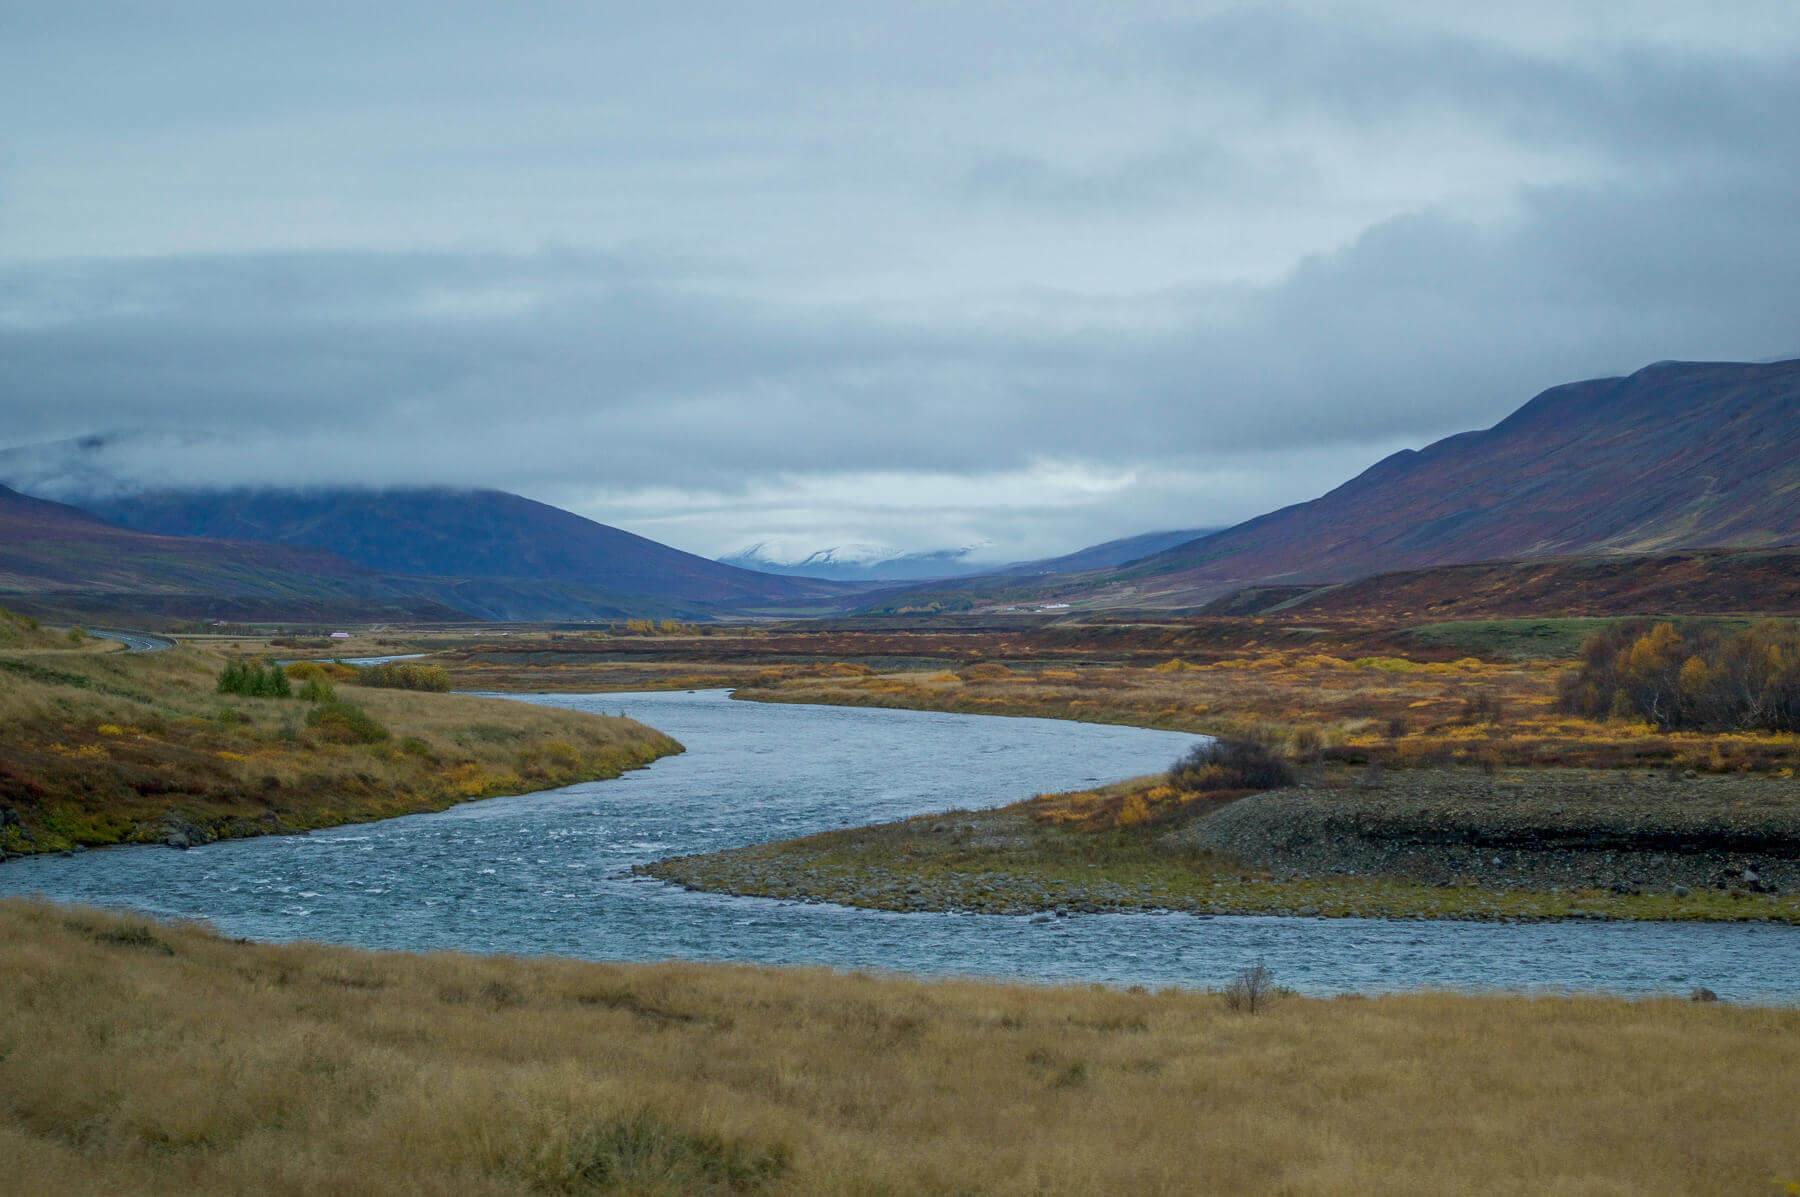 River running through a huge valley